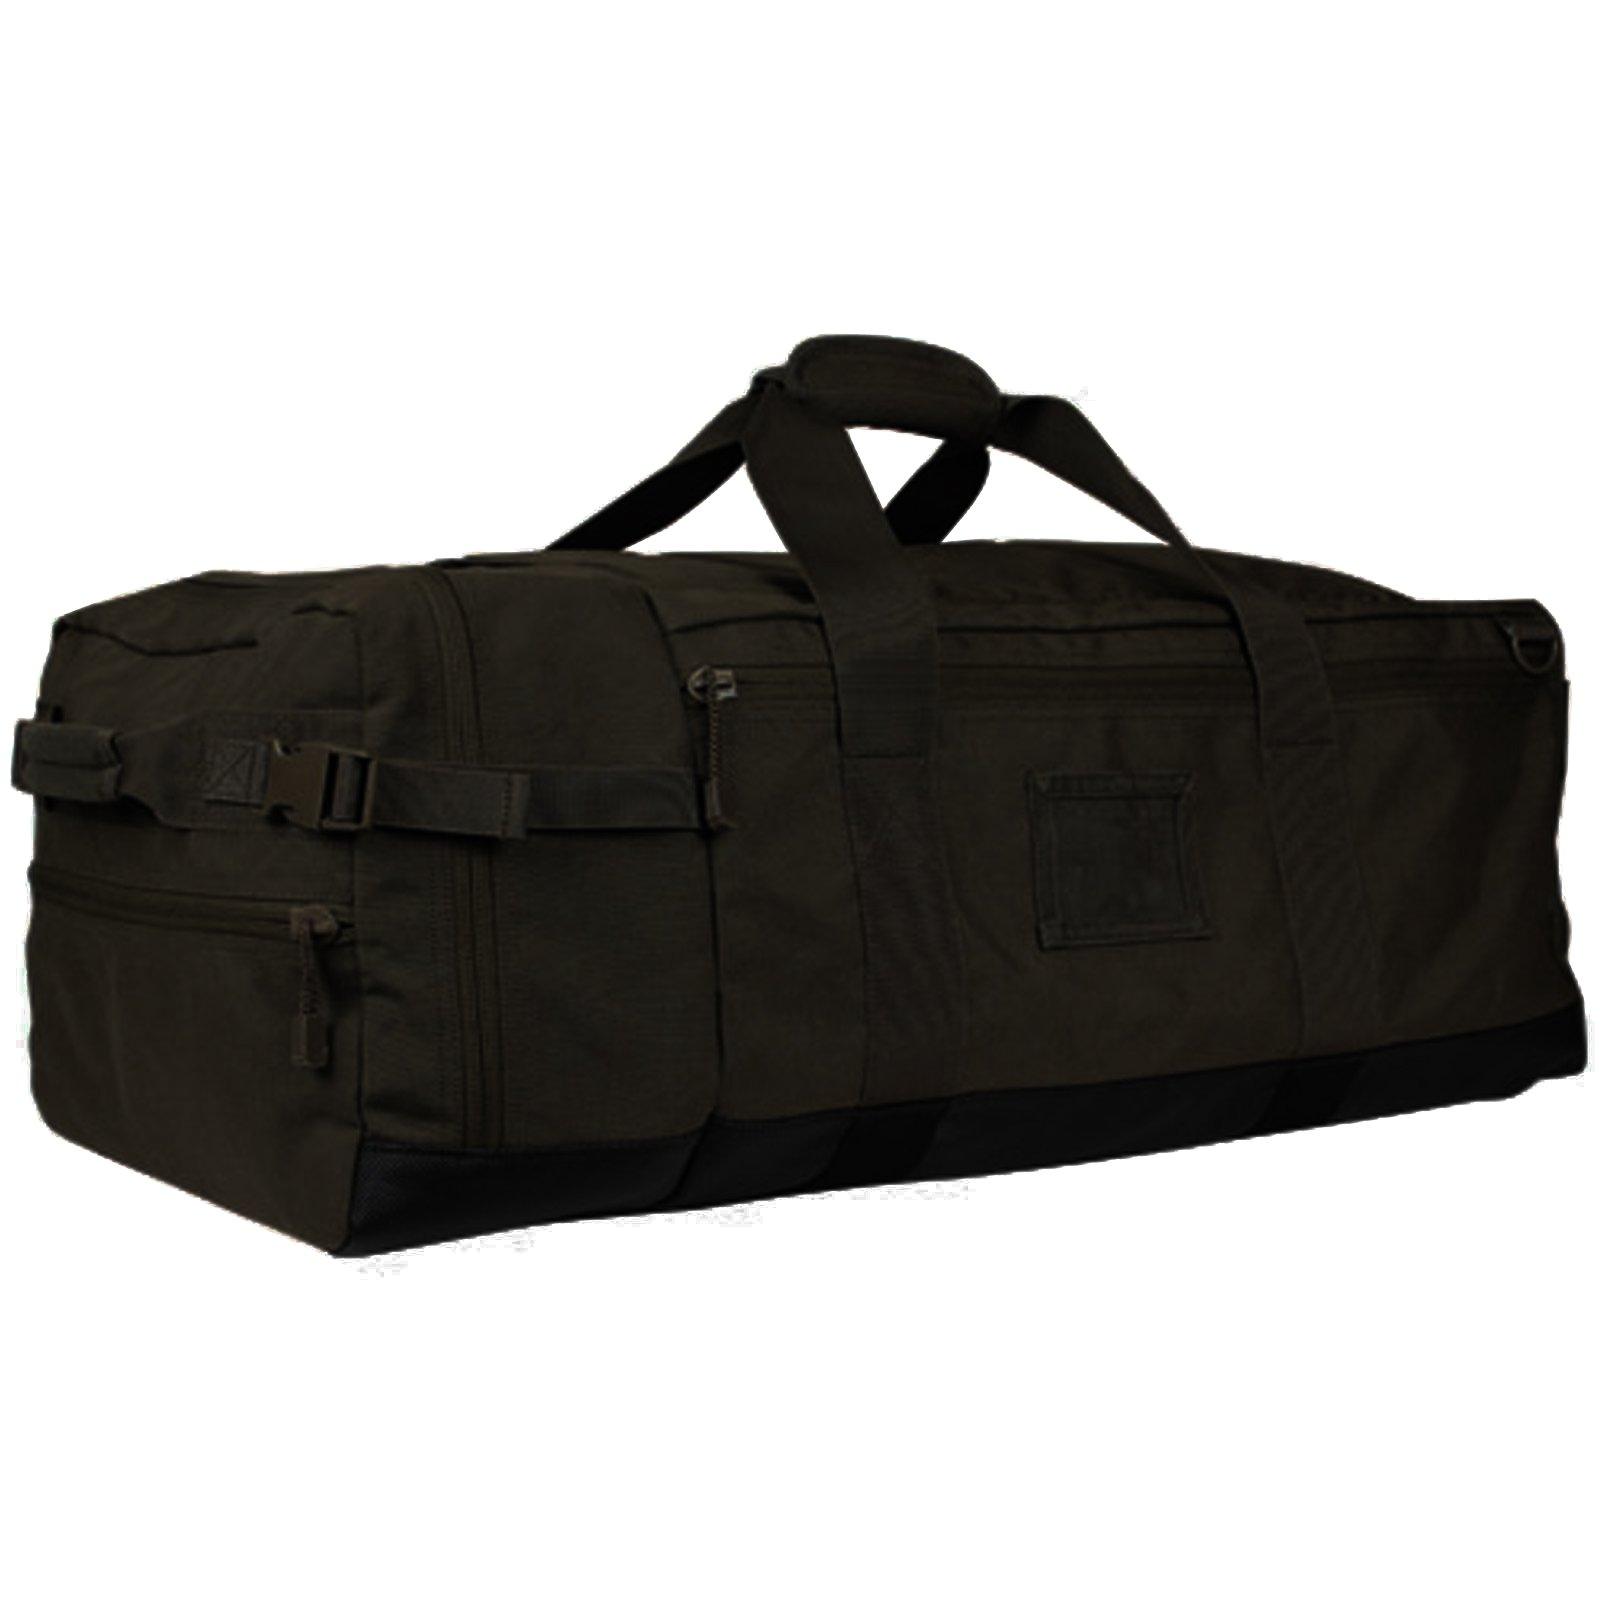 Condor Collossus Duffle Bag - Black